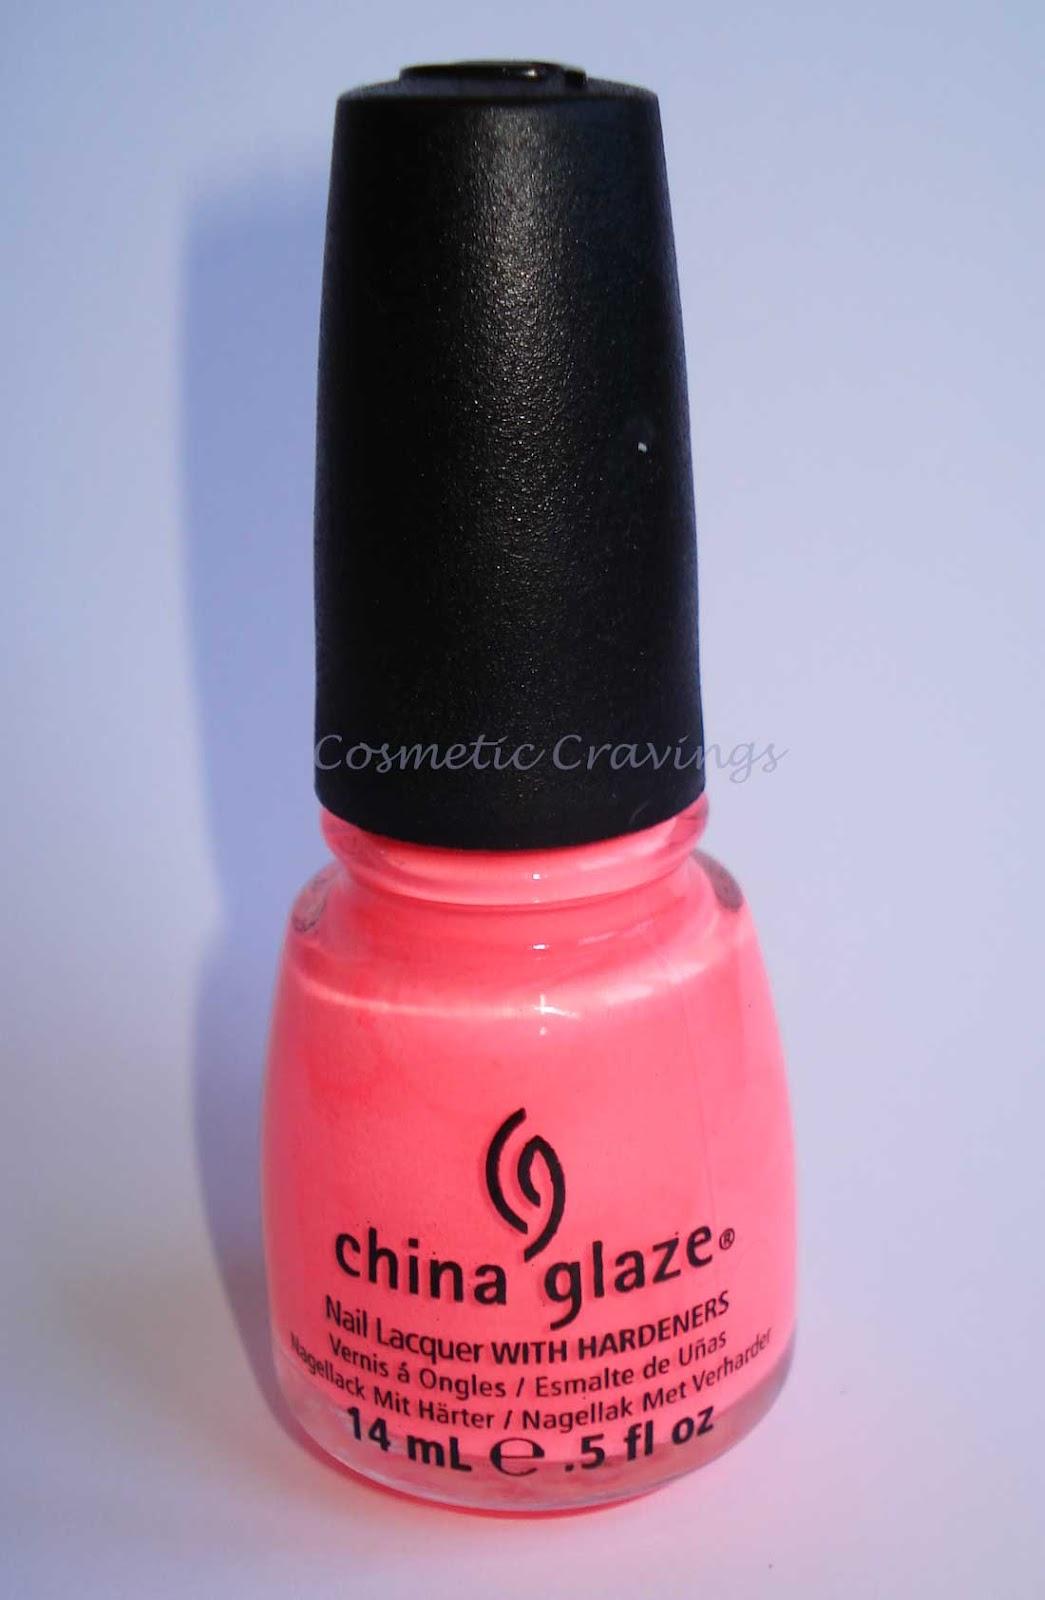 China Glaze Presenta Crakle Glaze: Cosmetic Cravings: China Glaze Flip Flop Fantasy